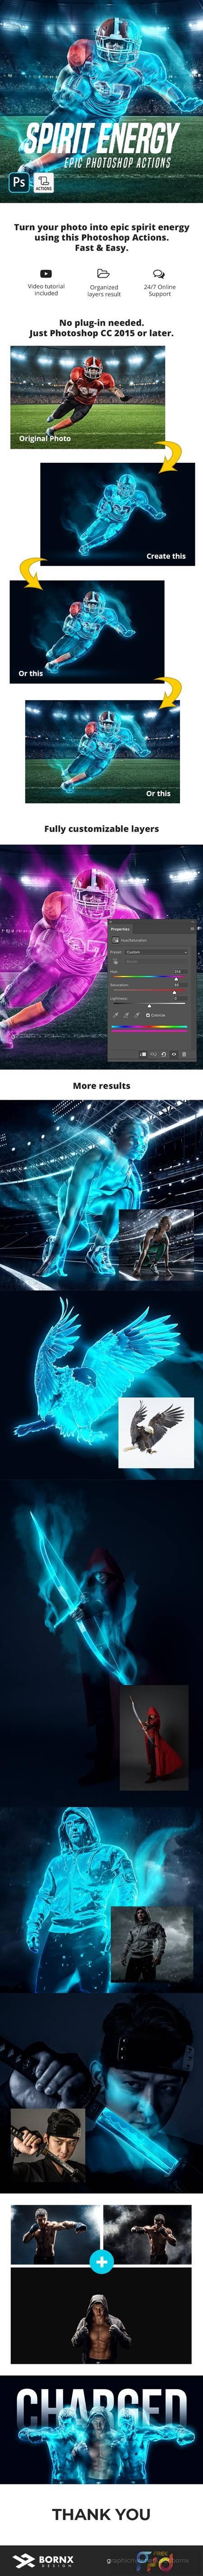 Spirit Energy Photoshop Action 29050788 1